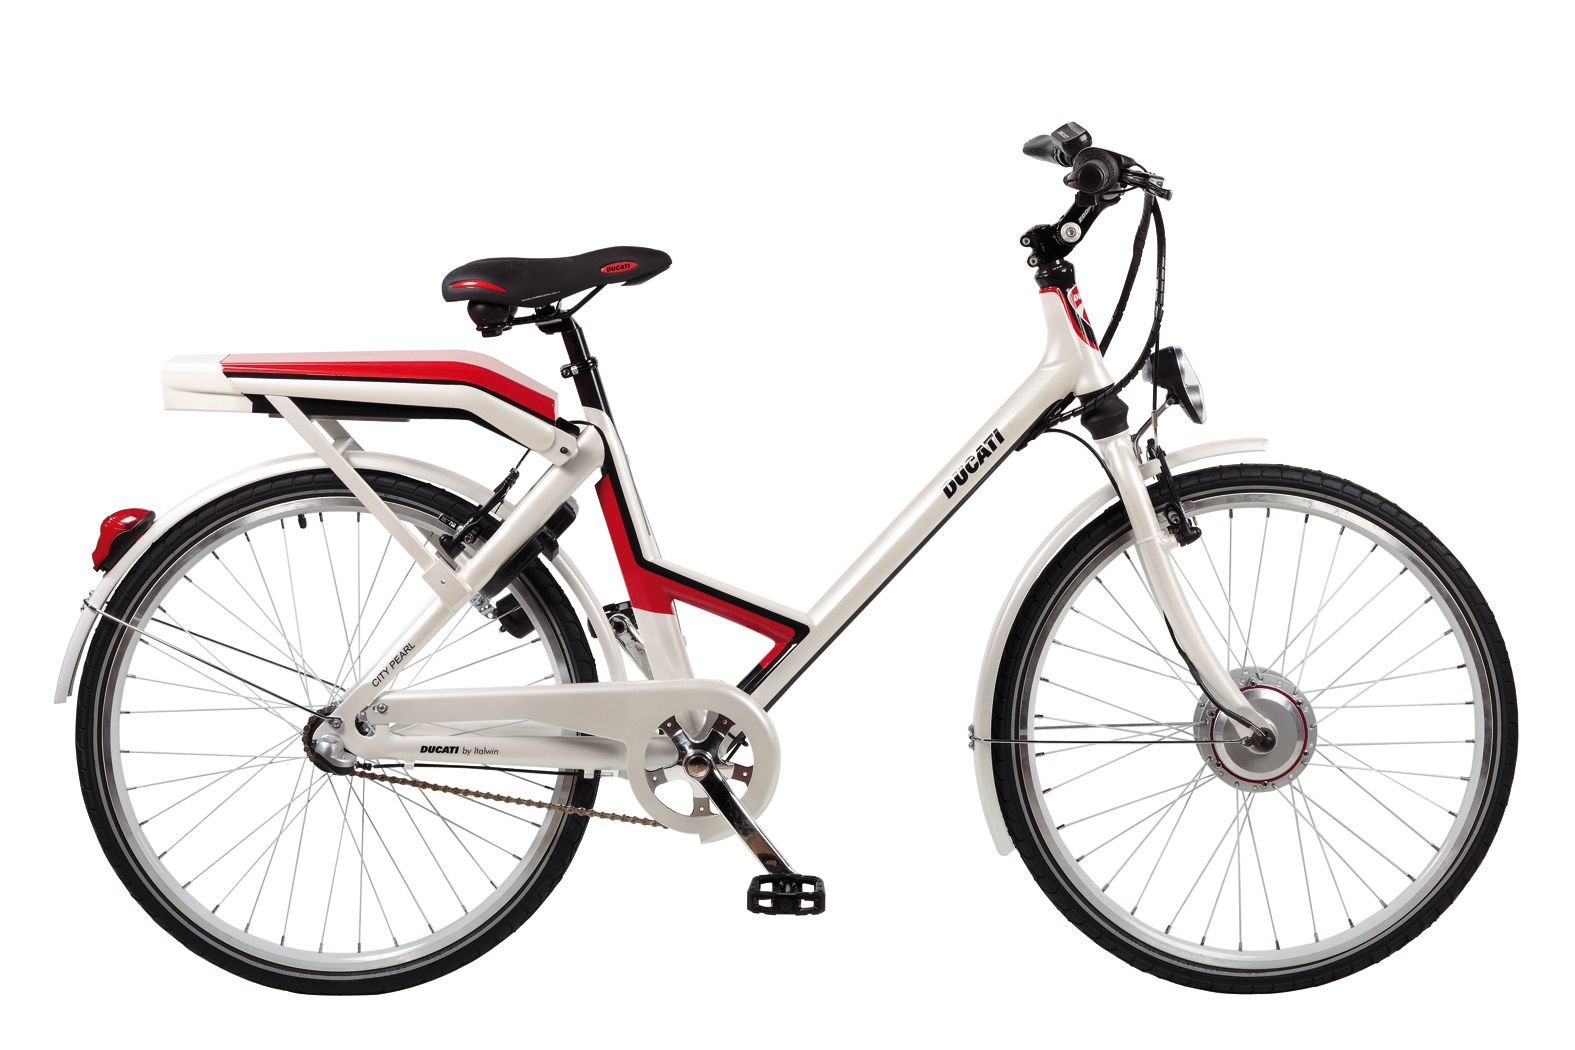 Ducati Italwin Electric Bicycles Motocorsa Com Ducati Bicycle Electric Bicycle